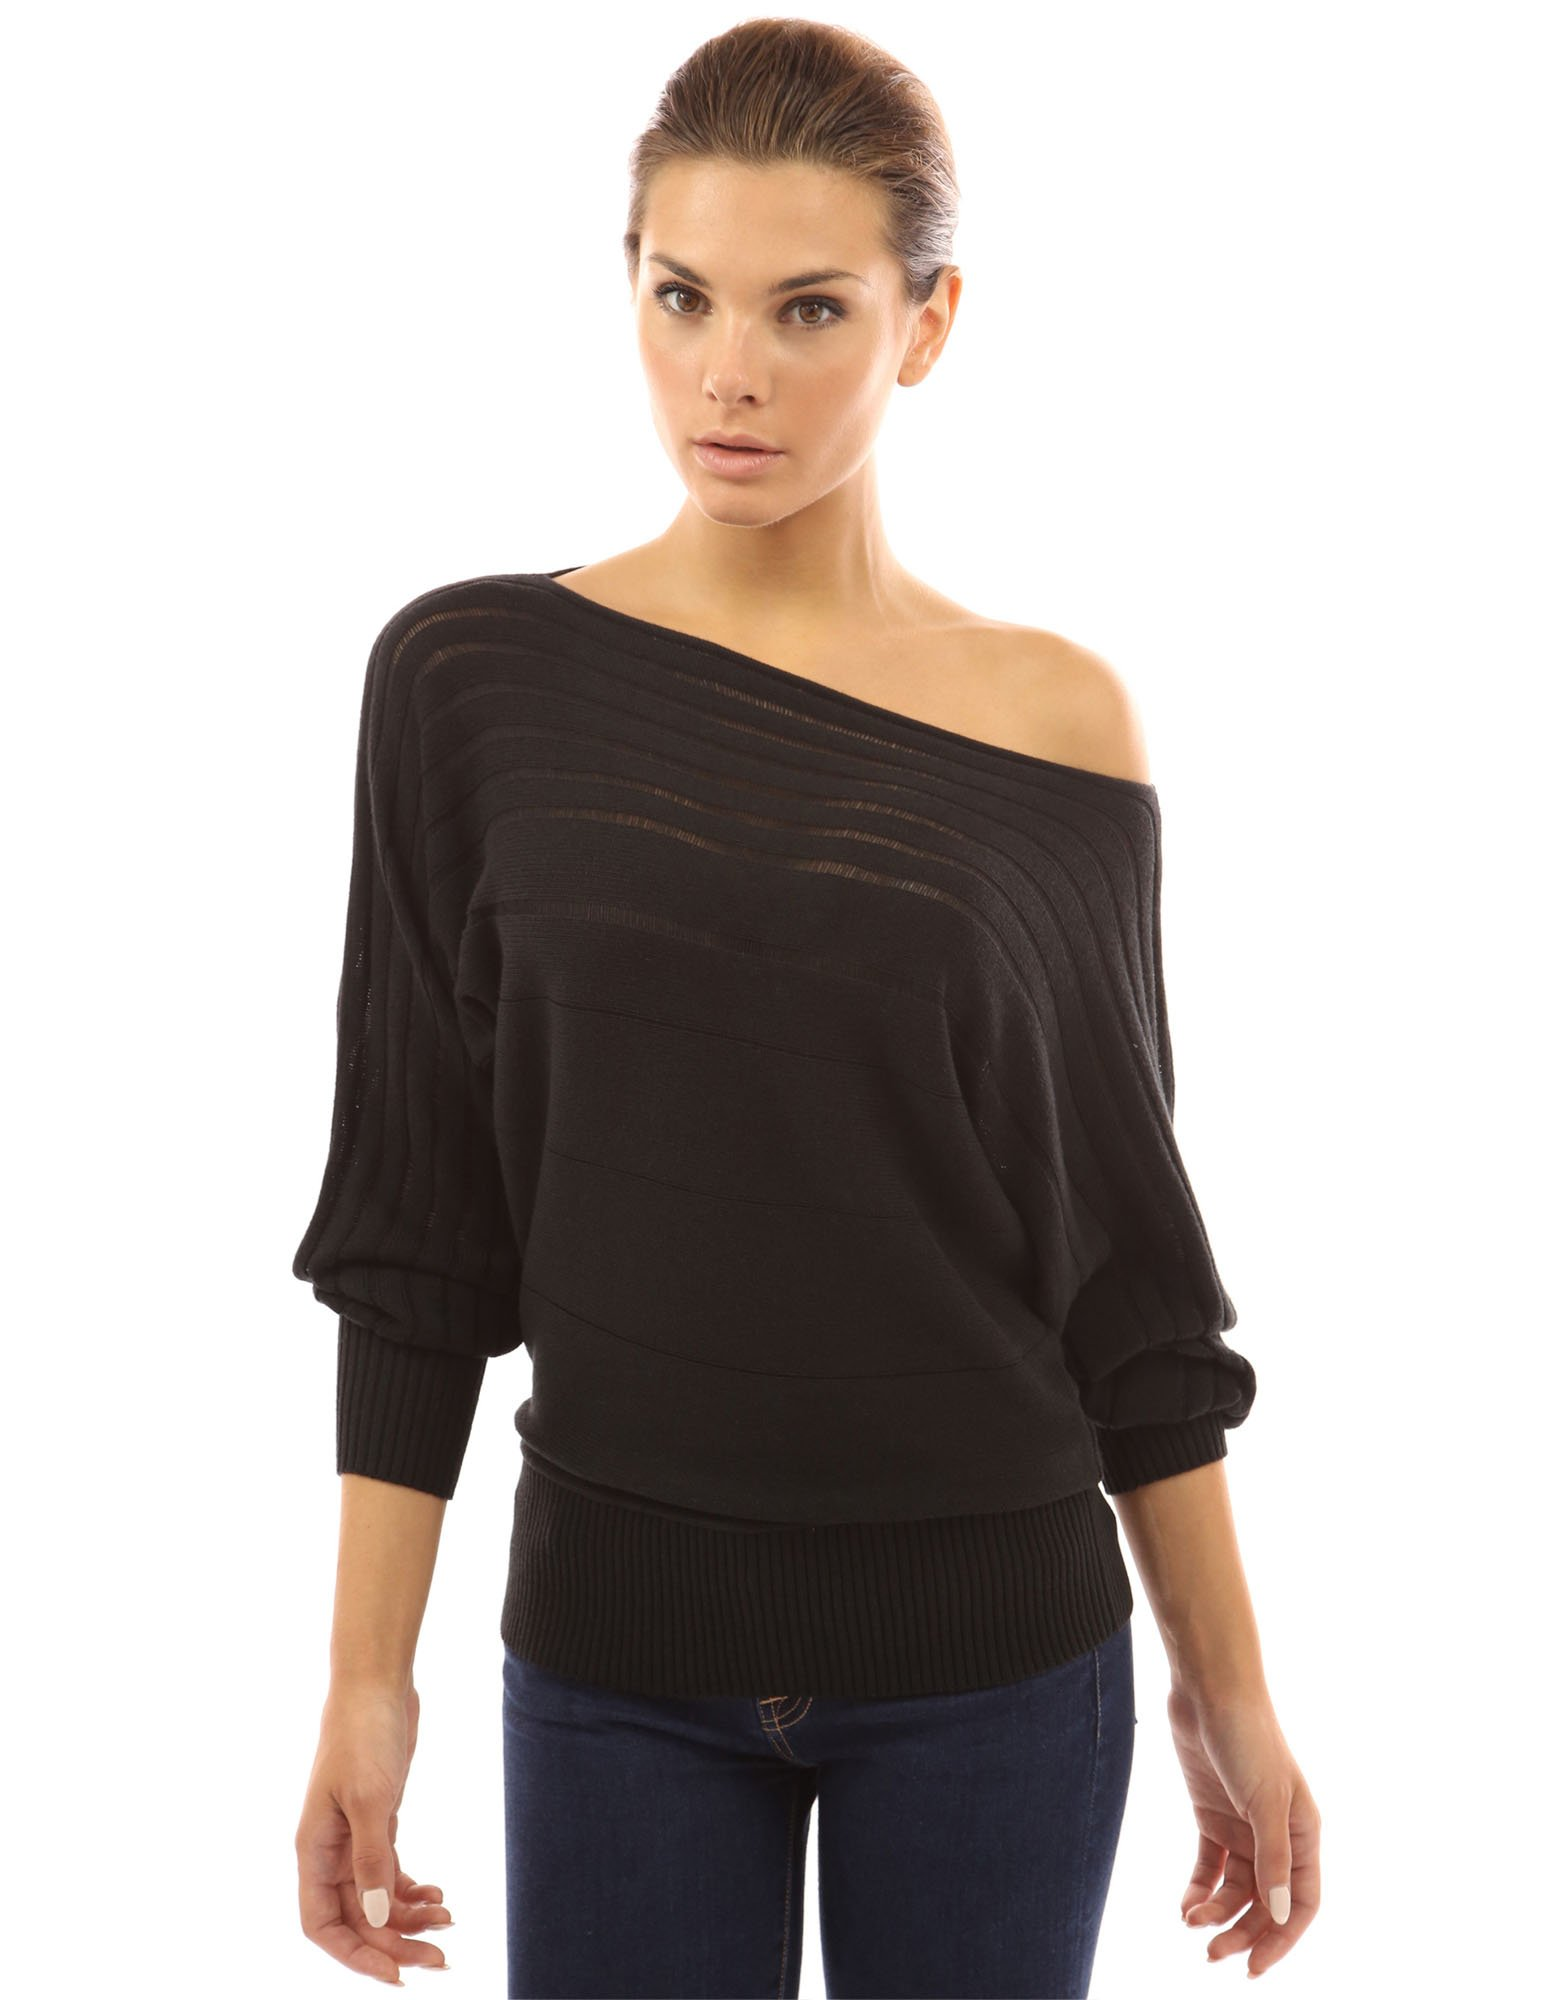 PattyBoutik Women's on / off one shoulder Semi-sheer Sweater (Black M)